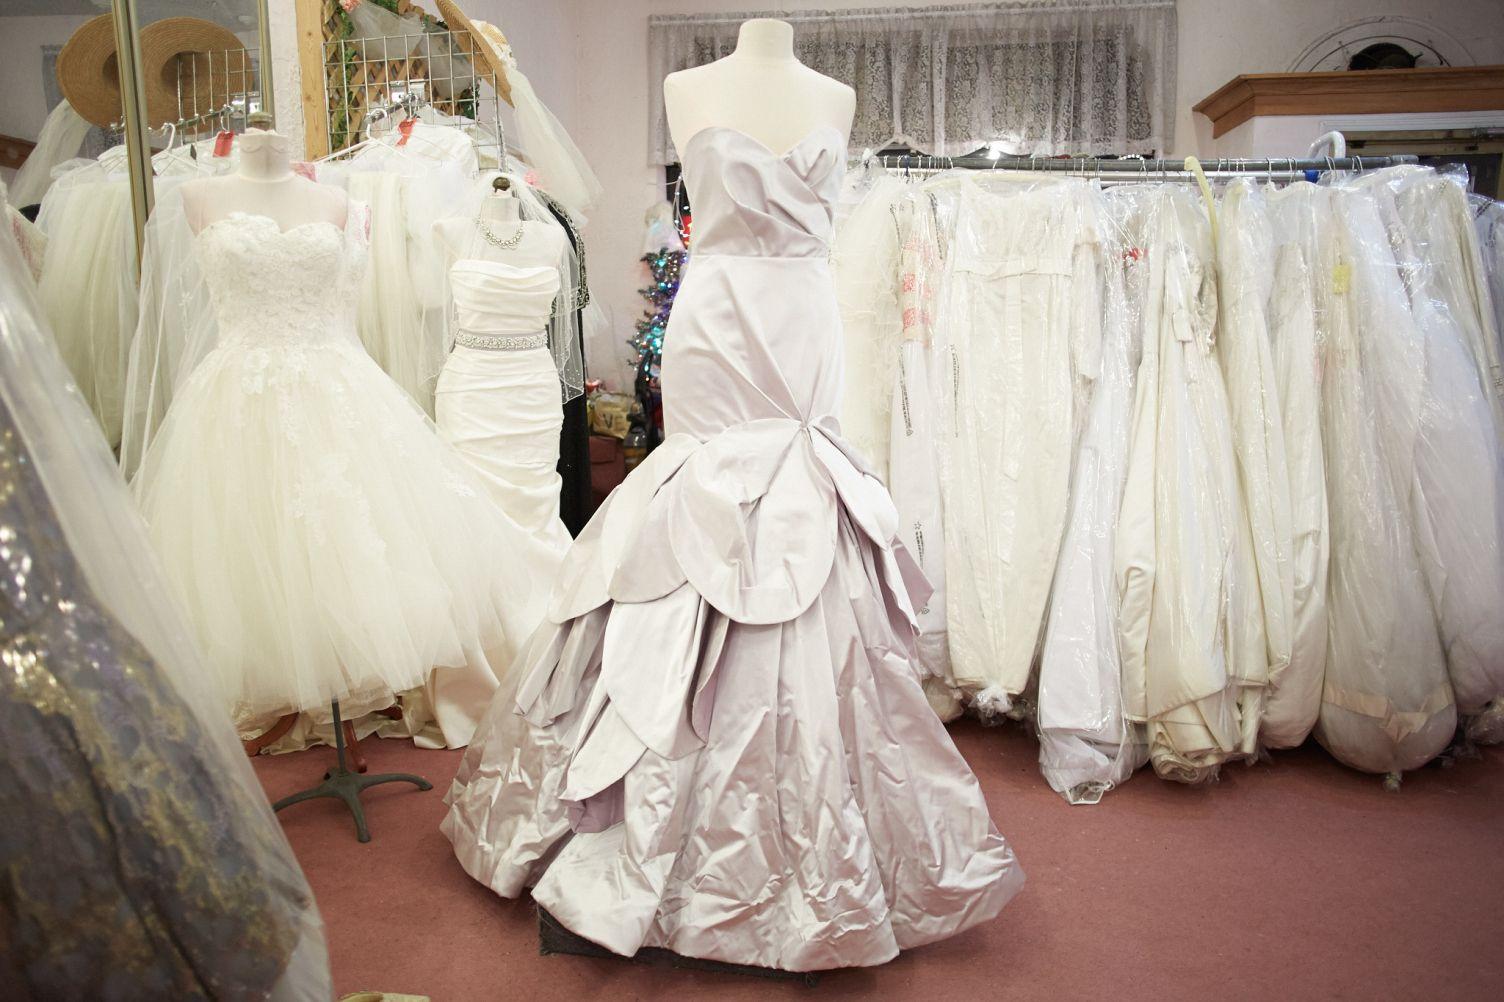 Superior Inspirational Used Wedding Dresses Chicago Check More At Http://svesty.com/ Used Wedding Dresses Chicago/